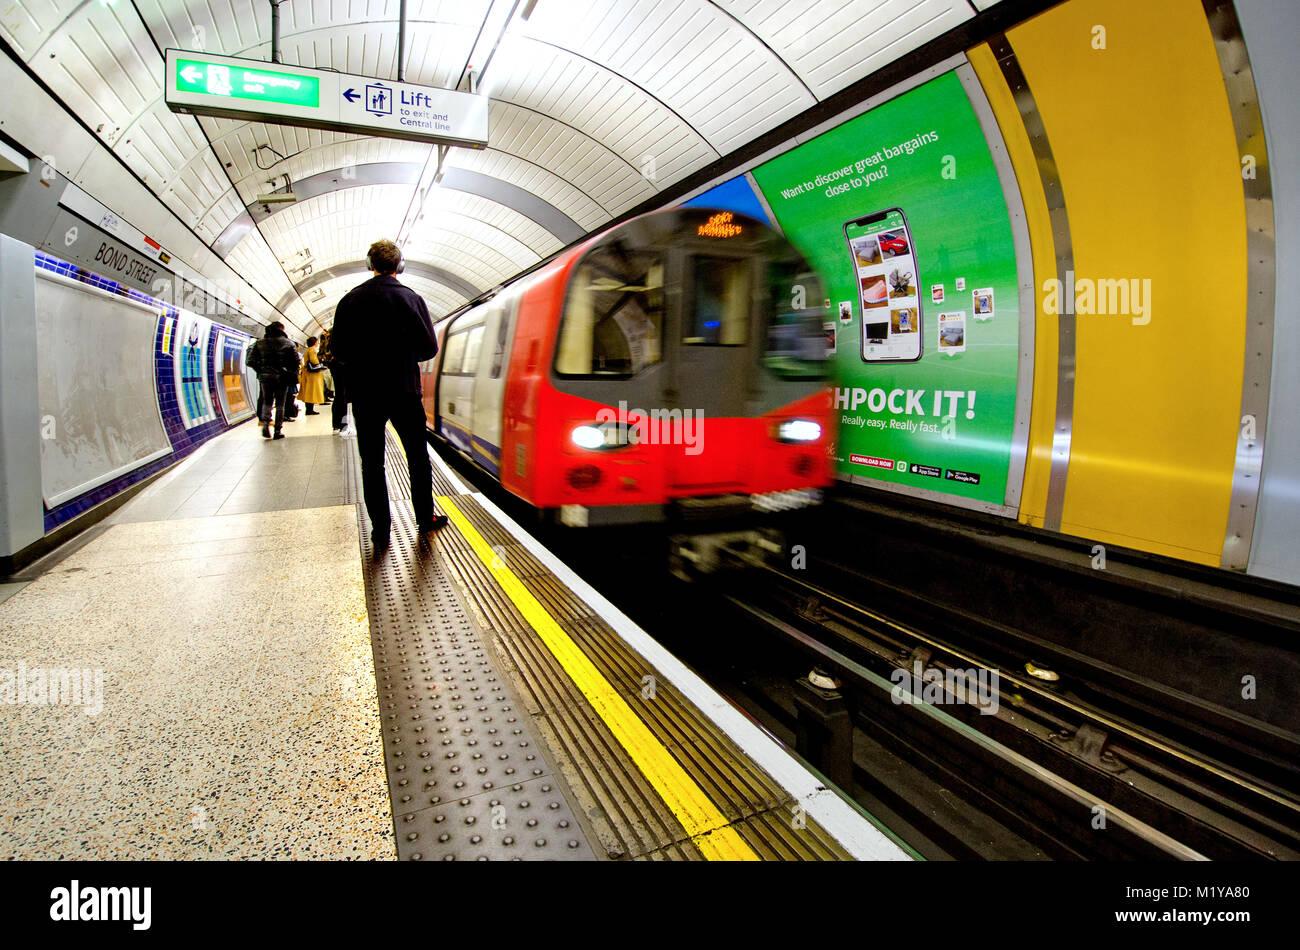 London, England, UK. Tube train arriving in Bond Street underground station - Stock Image